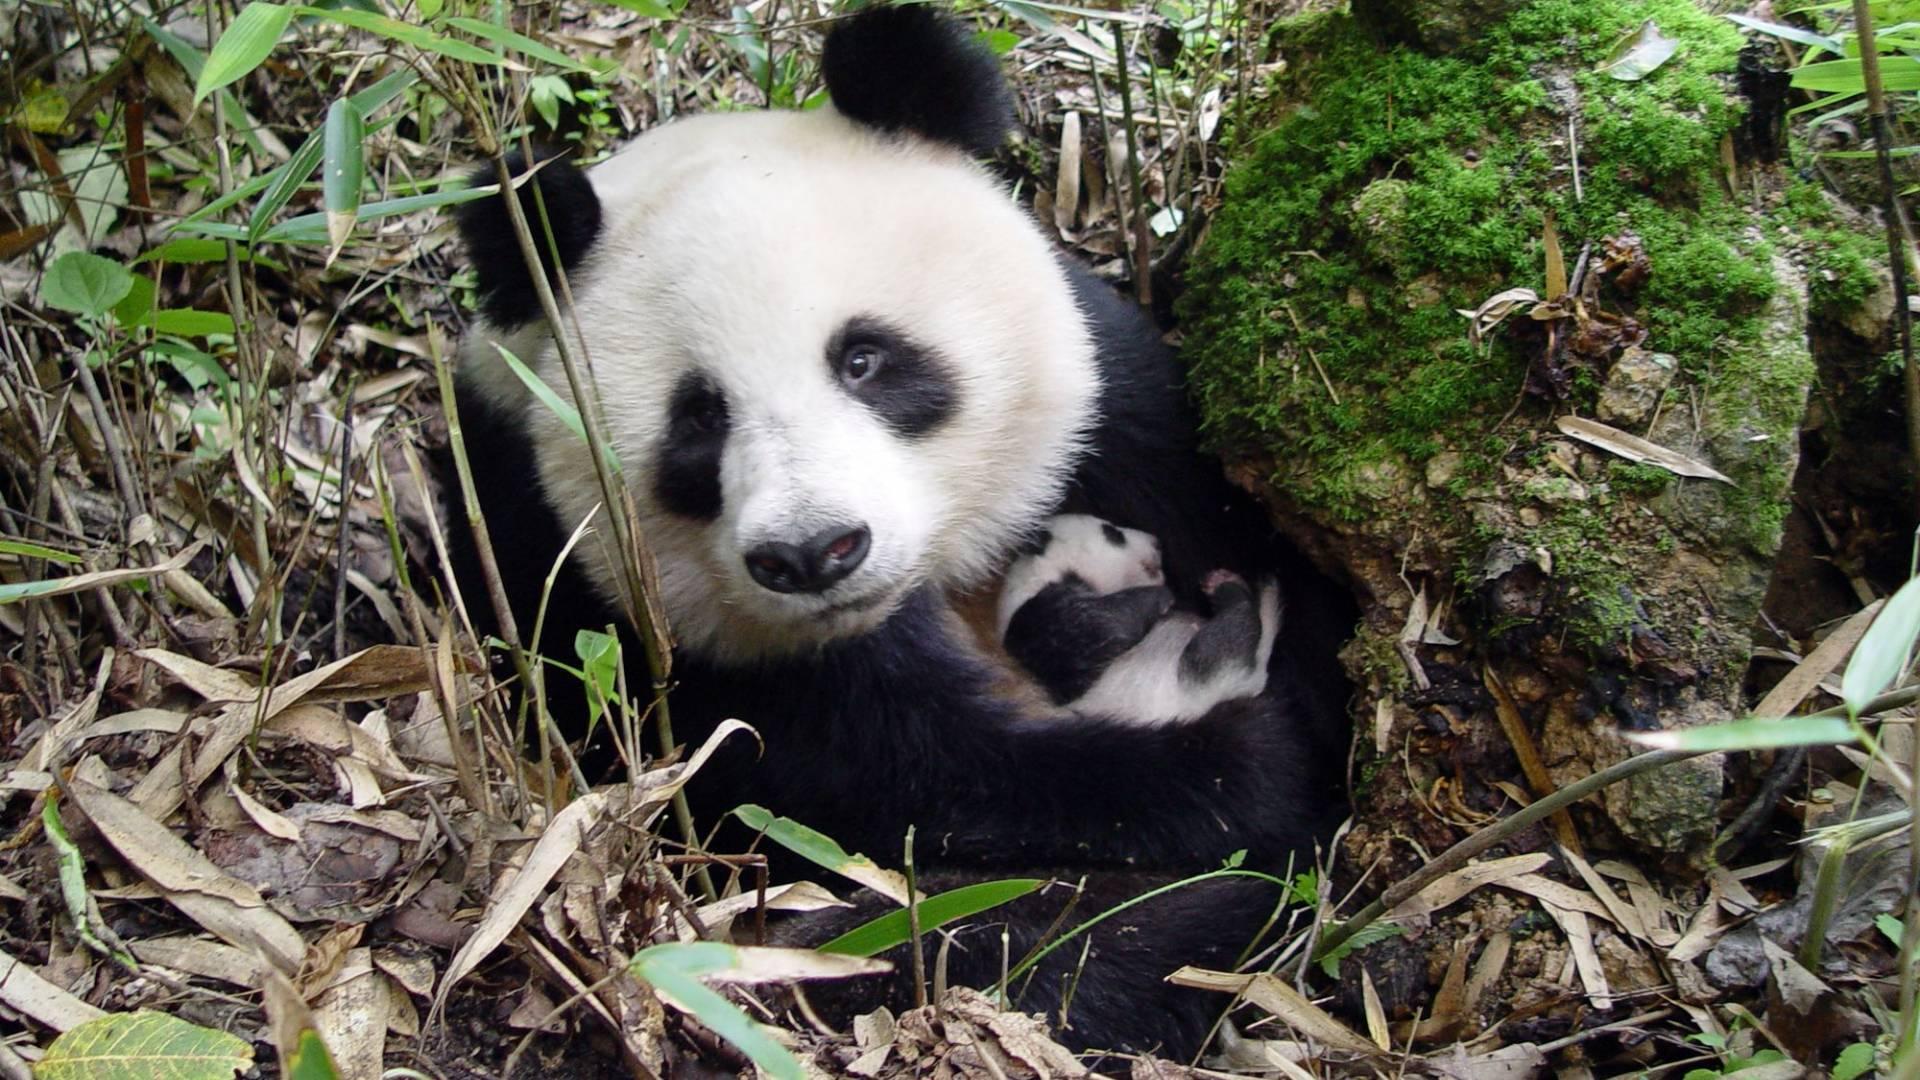 grosser panda liebenswerter vegetarier wwf schweiz. Black Bedroom Furniture Sets. Home Design Ideas